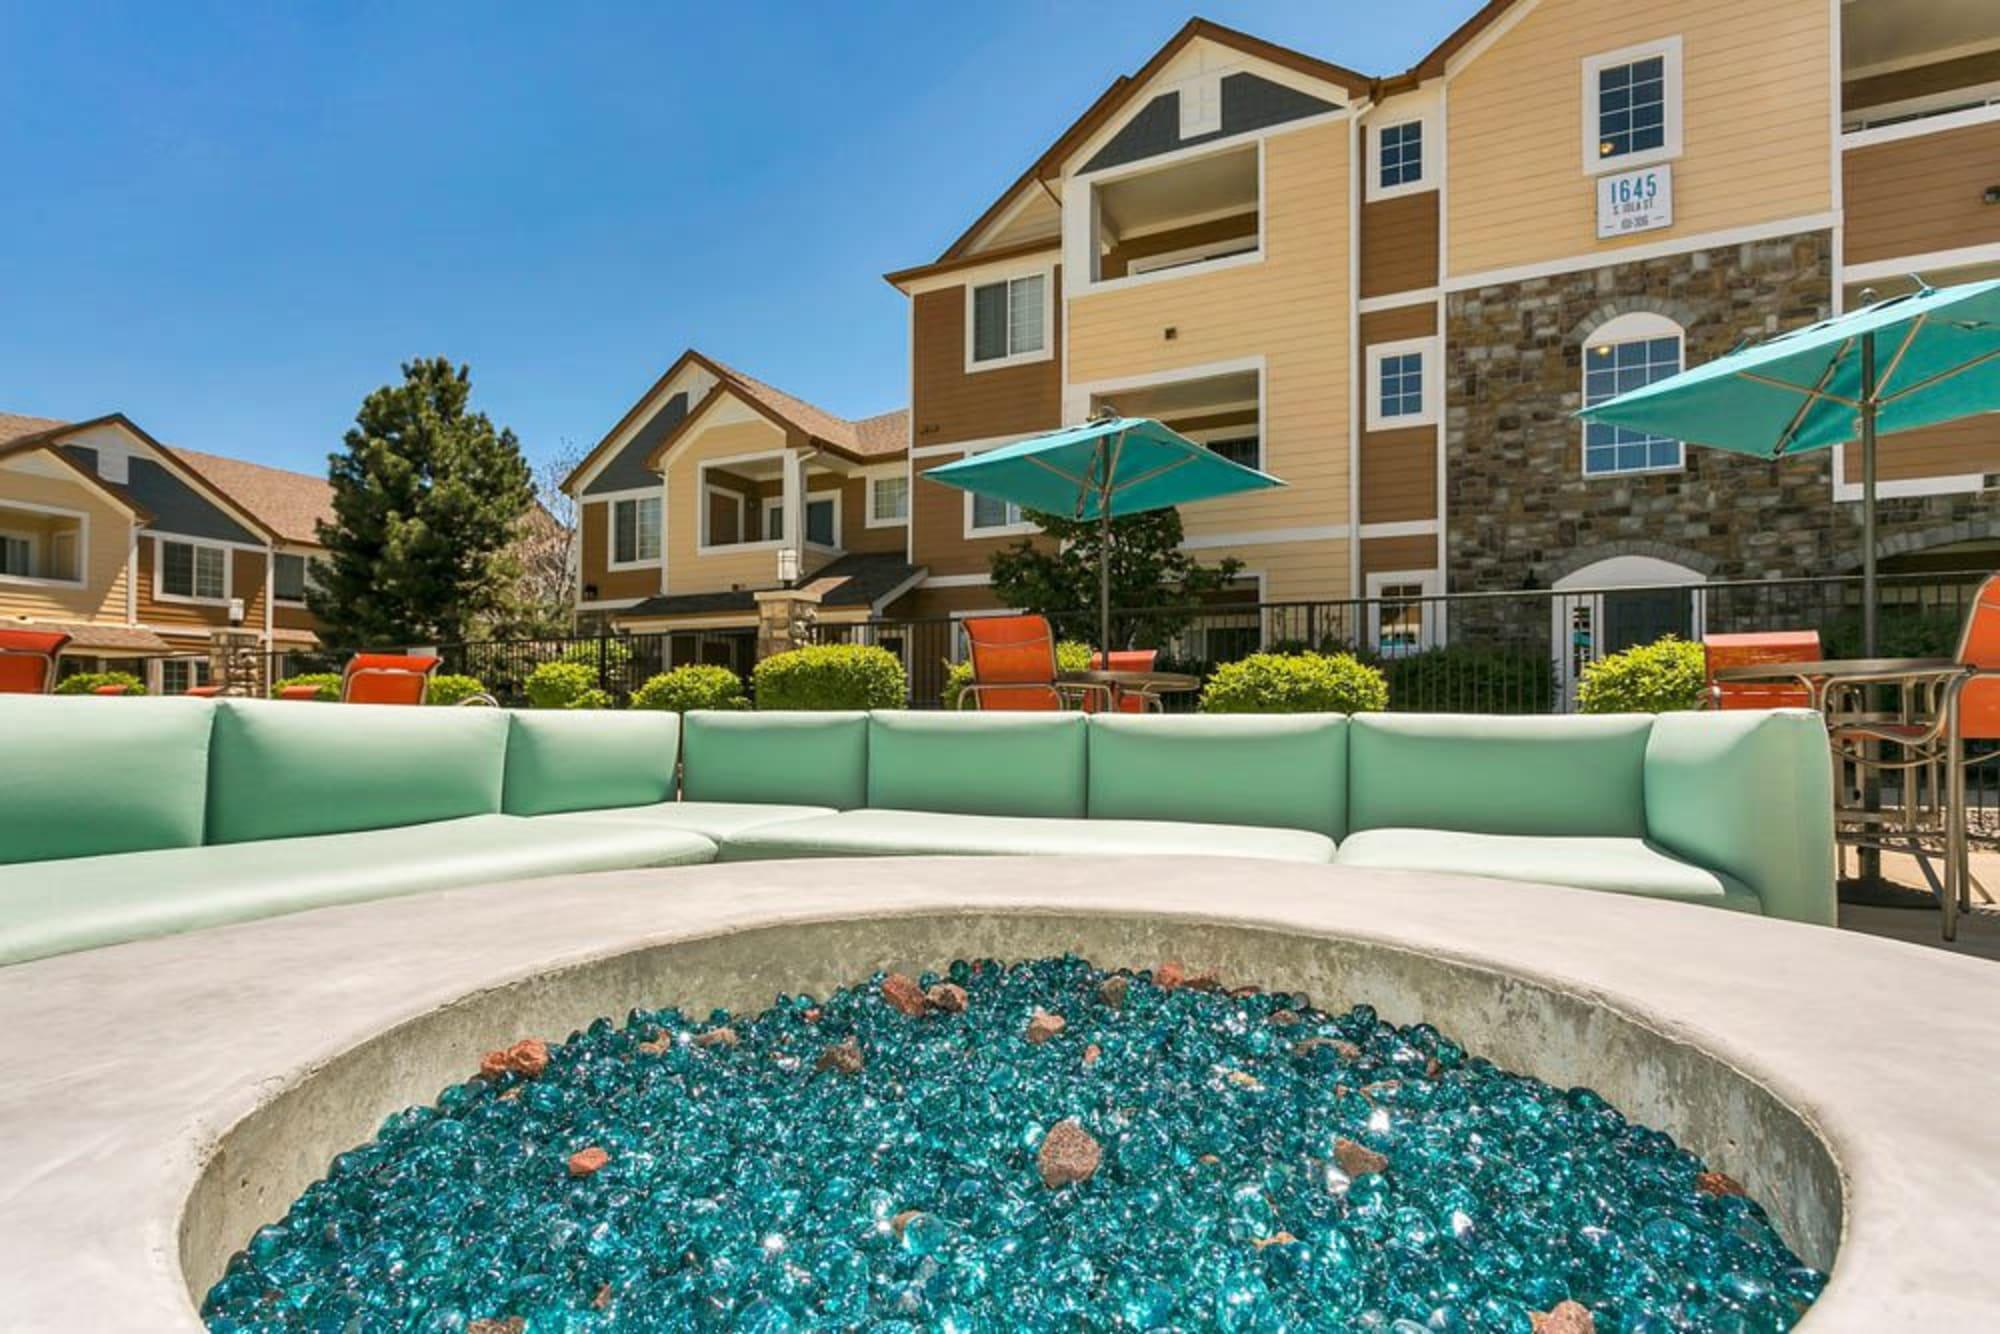 Poolside seating at Crestone Apartments in Aurora, Colorado